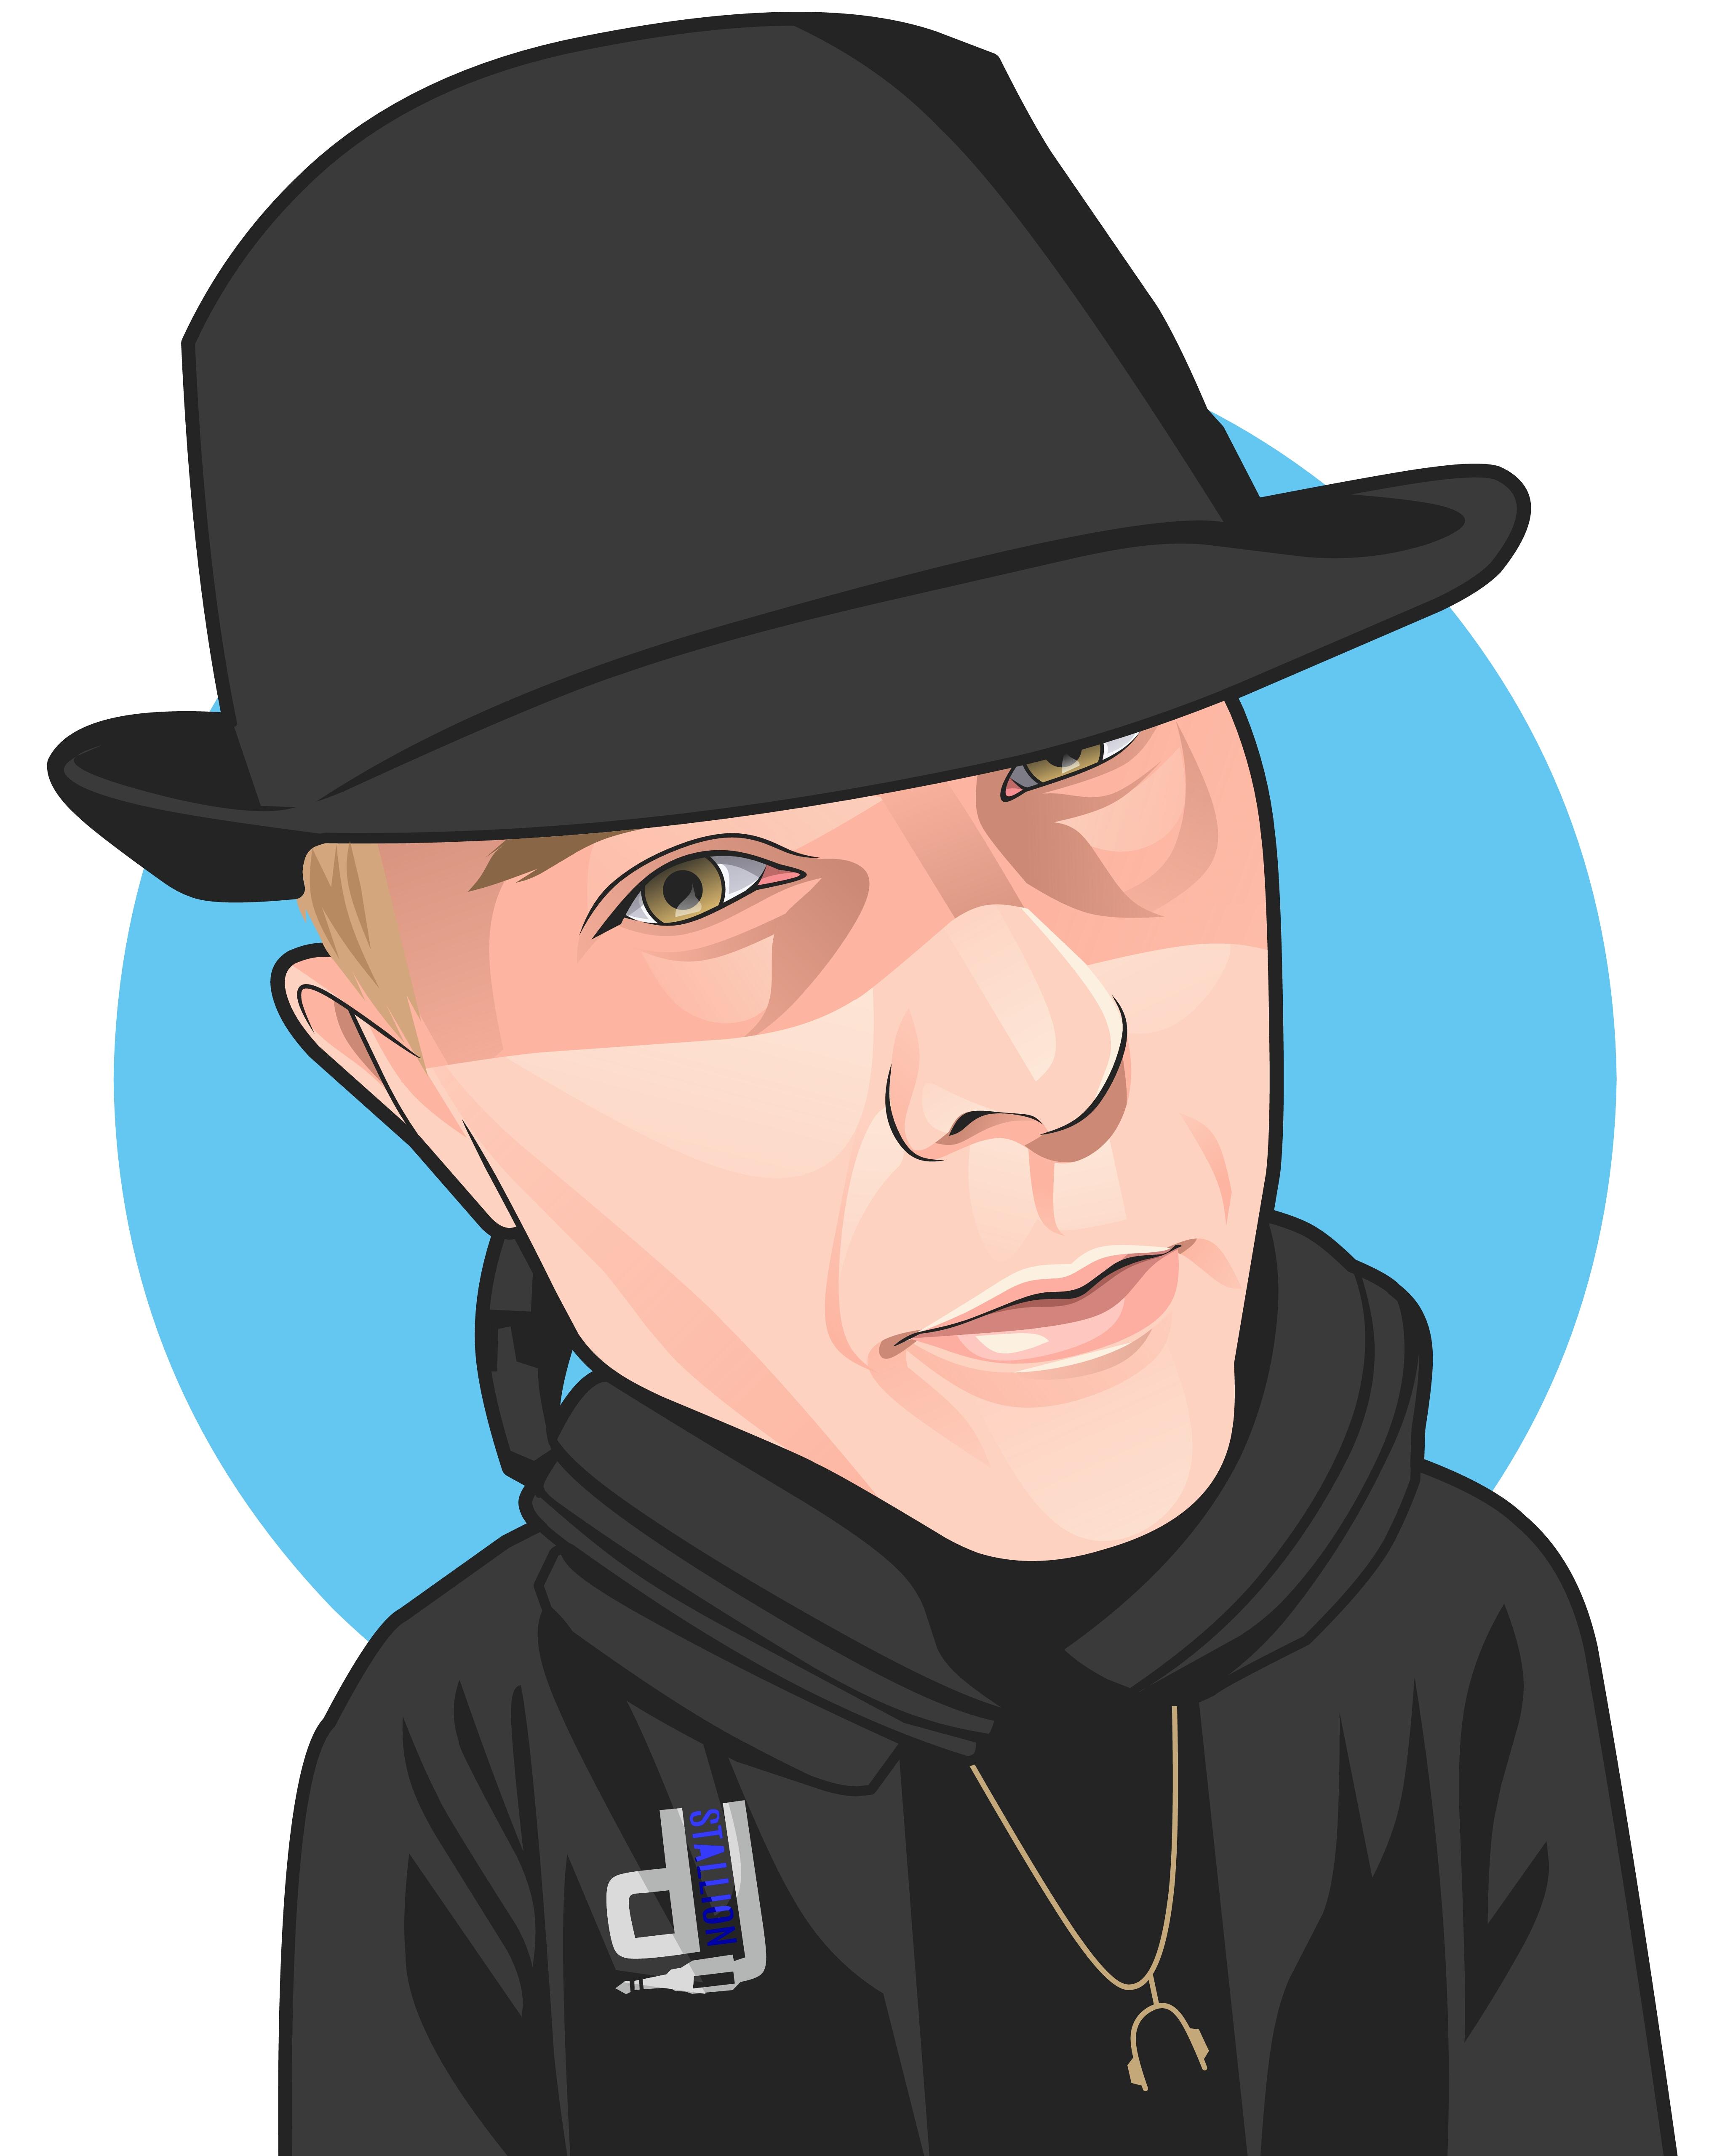 DJ Stallion by VectorHugoMEDIA